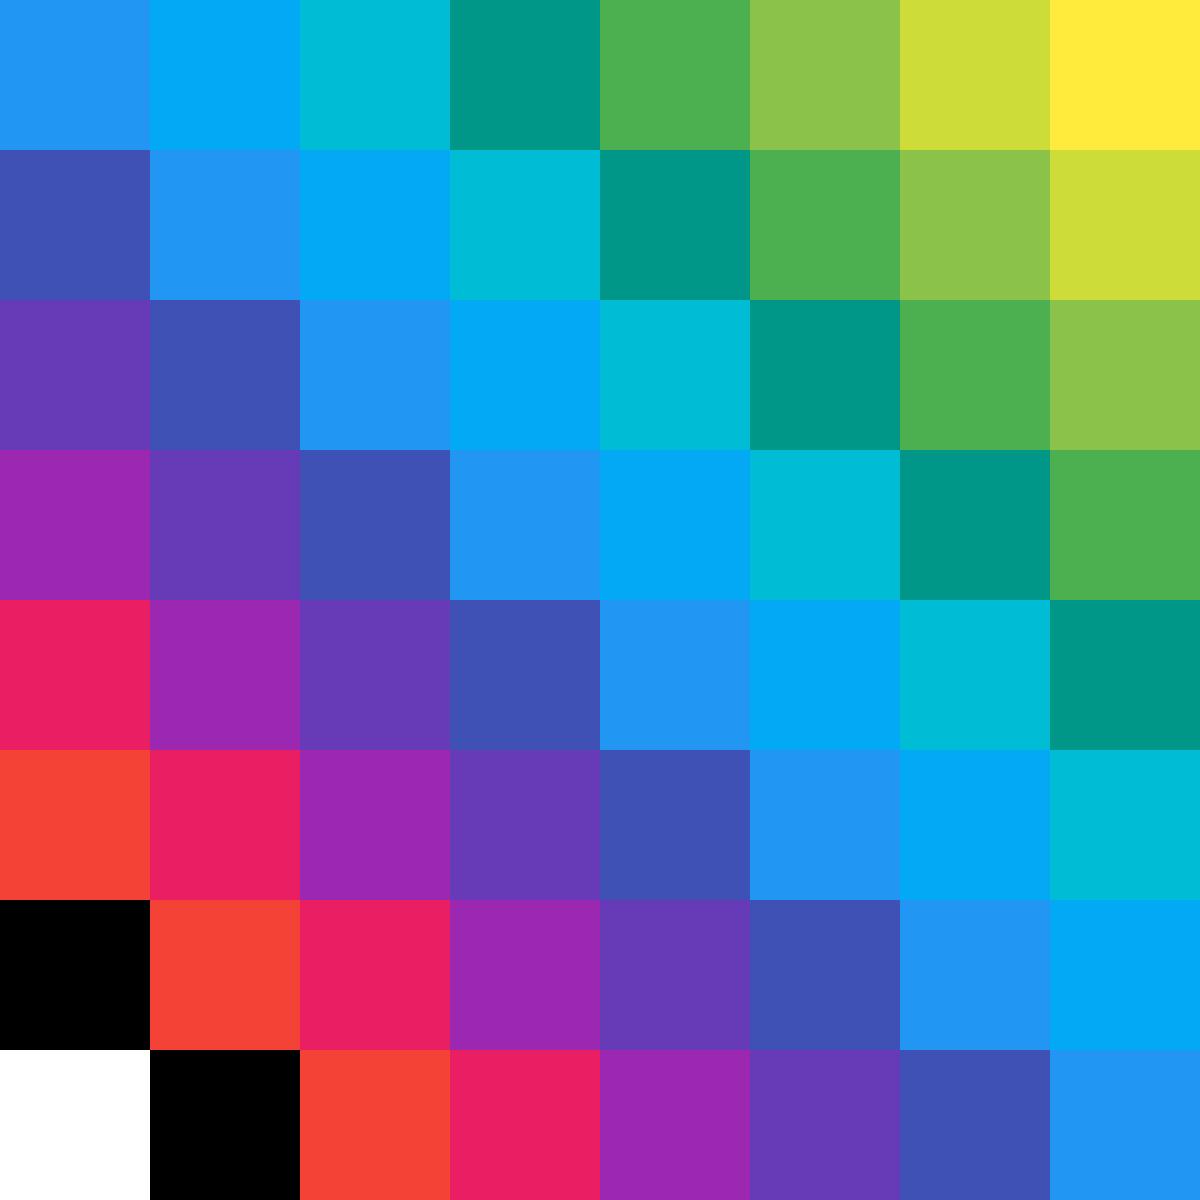 8*8 Drawing Rainbow by AmmazingBubby34